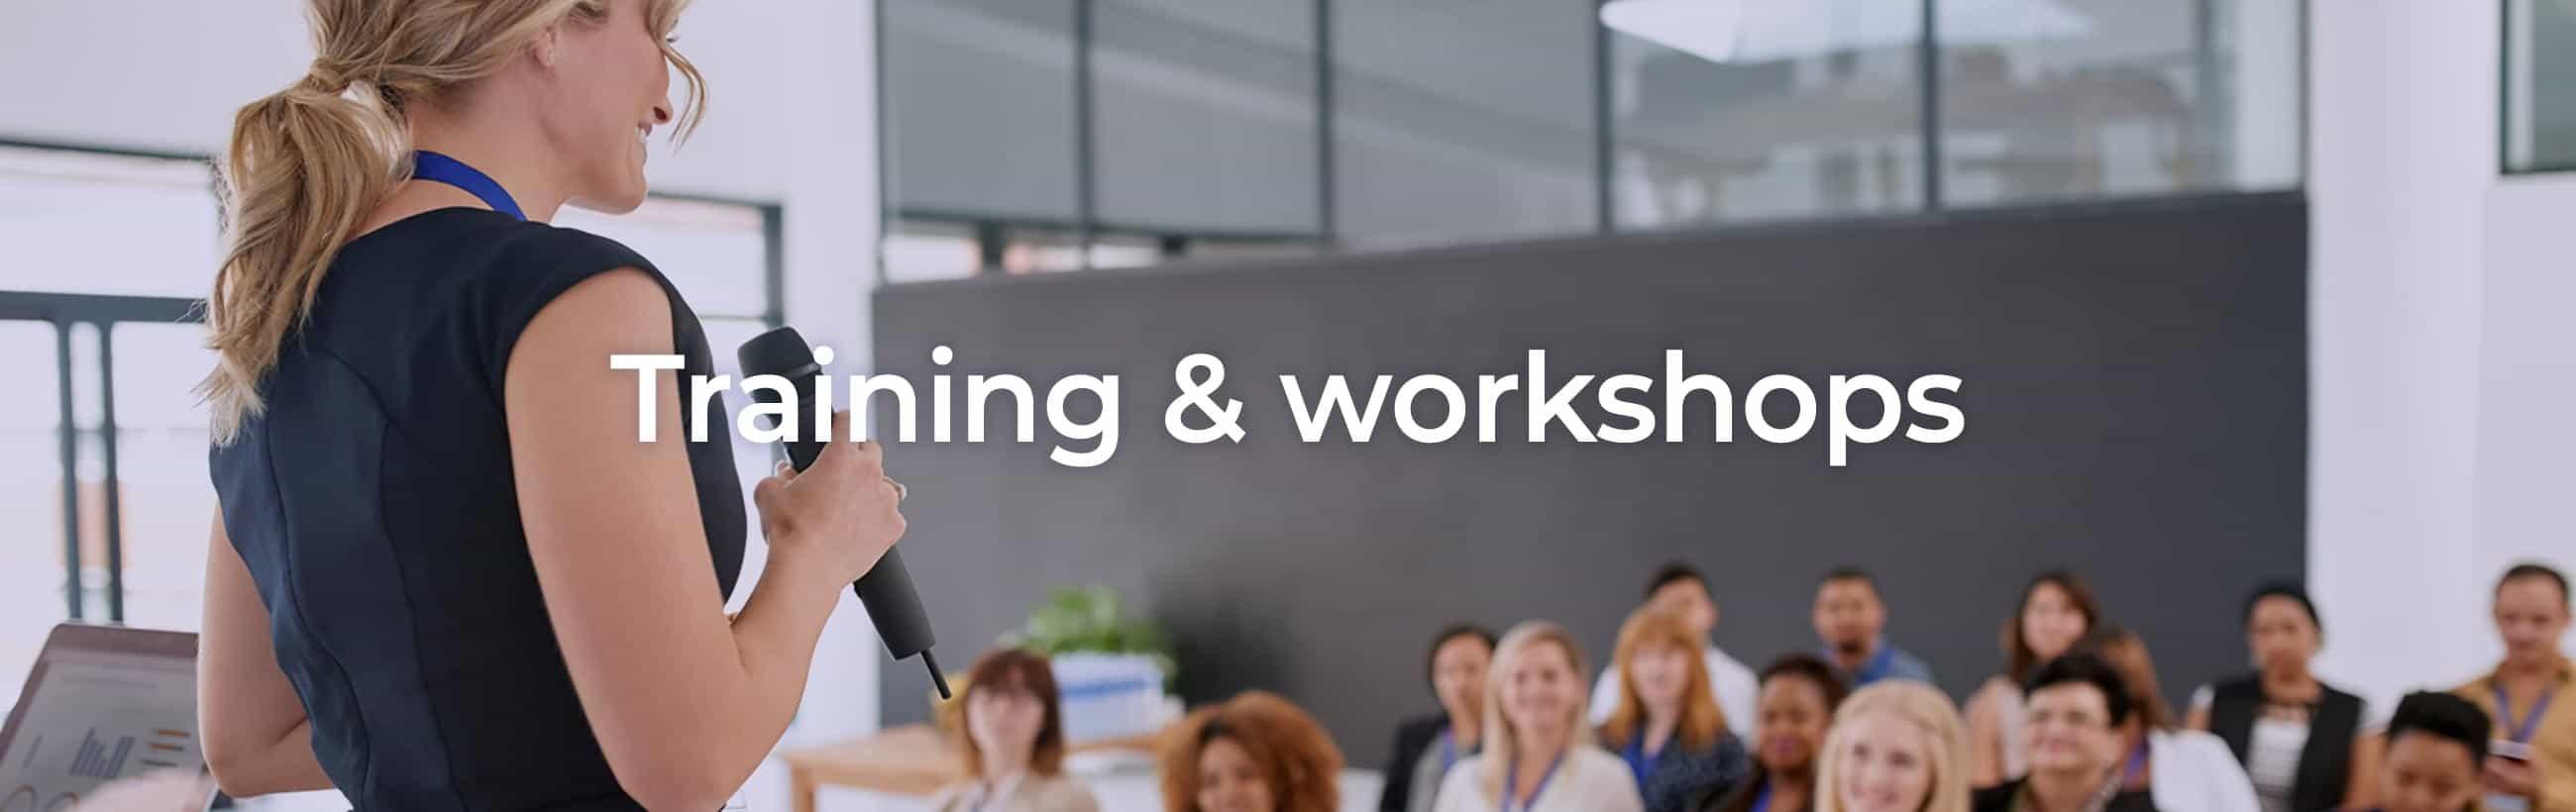 Training & workshops b2b - Blueberry Hill